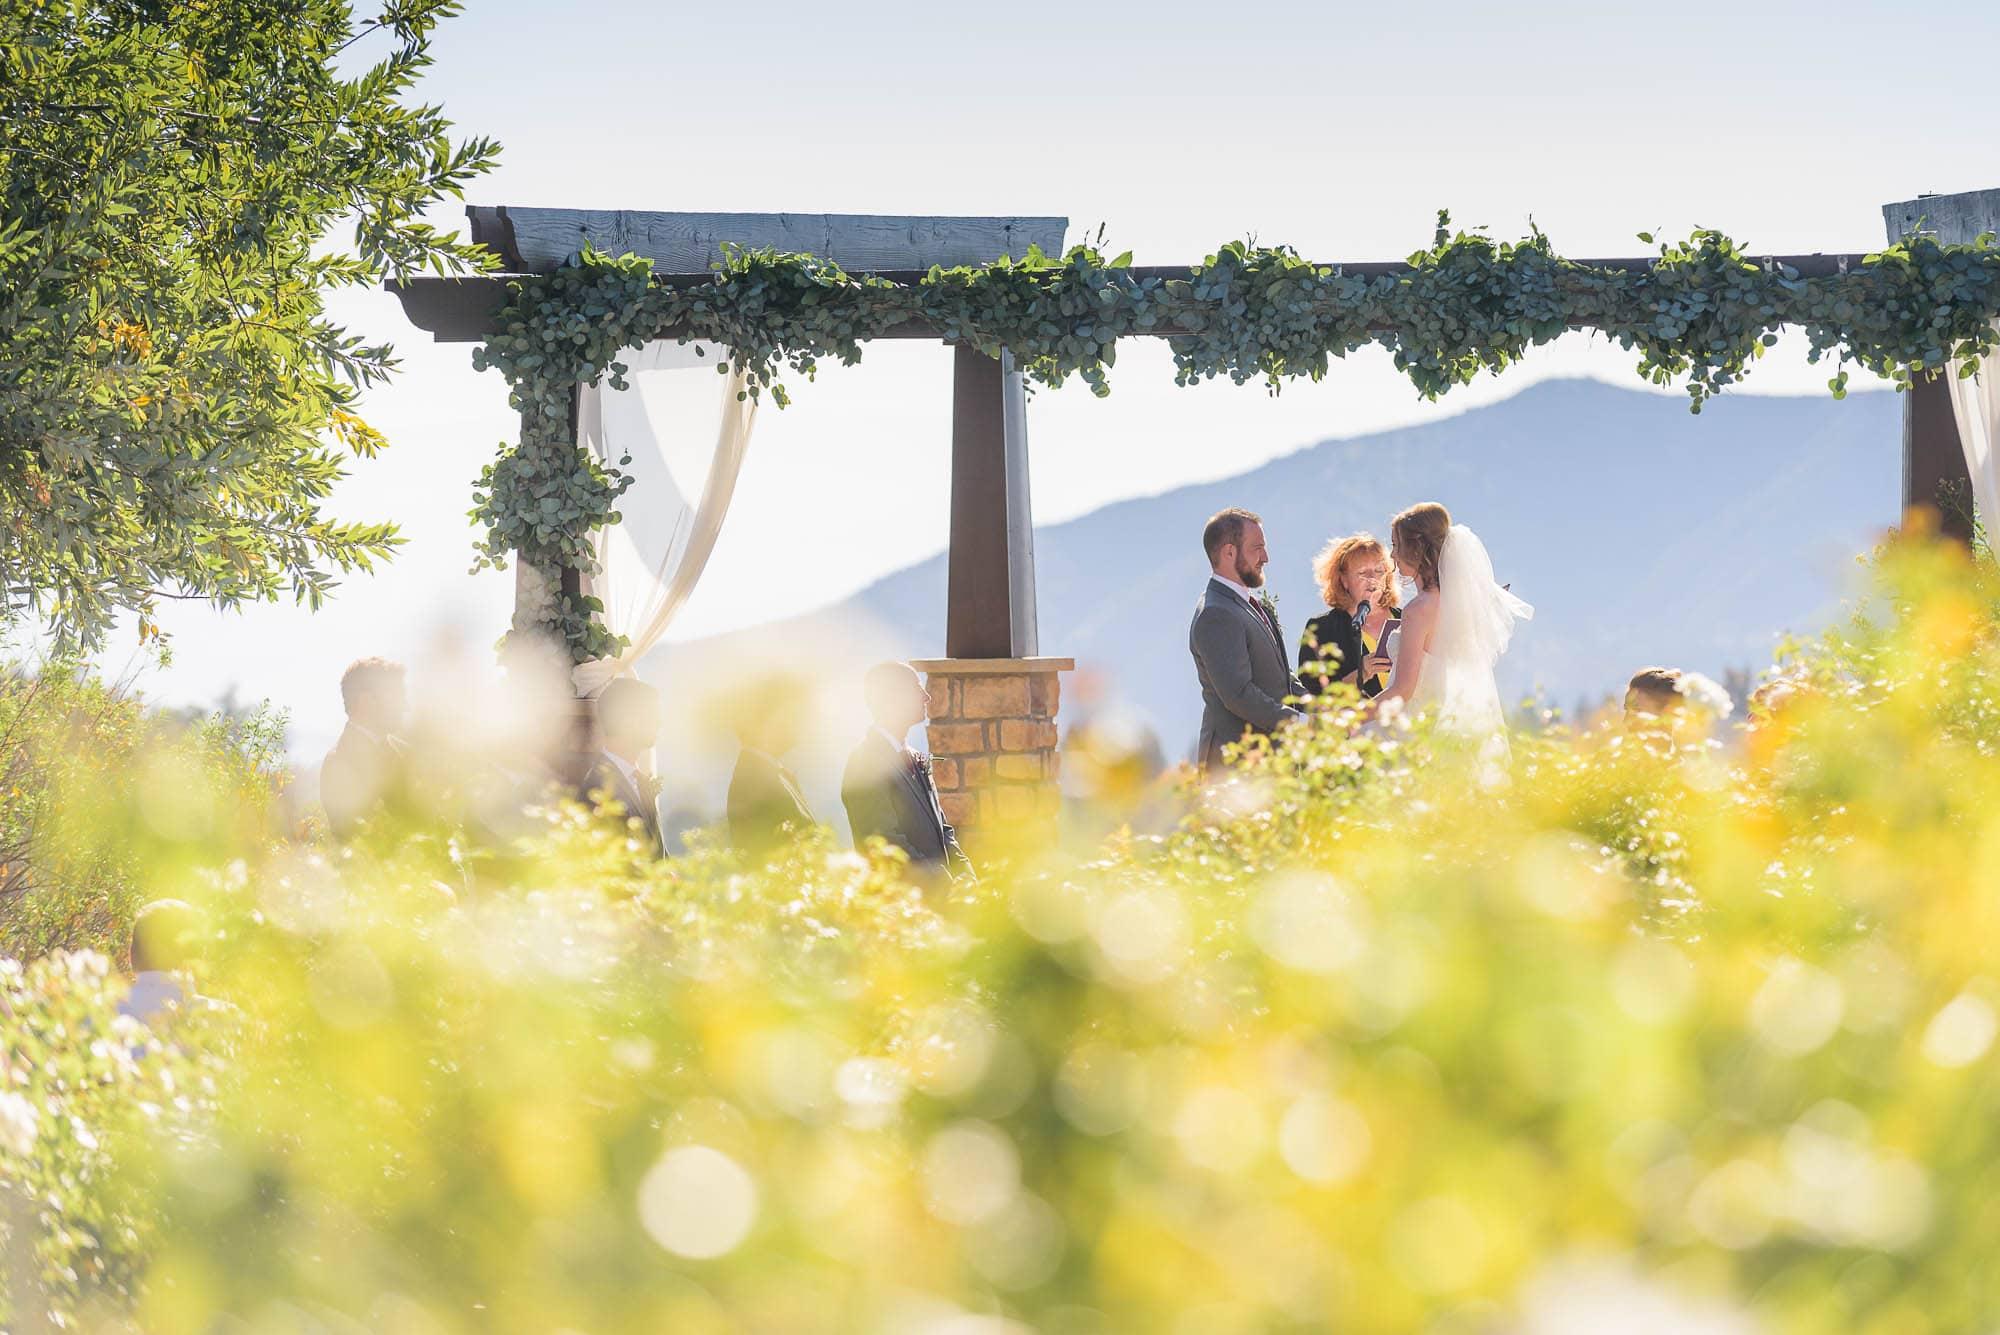 208_Alan_and_Heidi_Serendipity_Garden_Wedding_10-27-2018